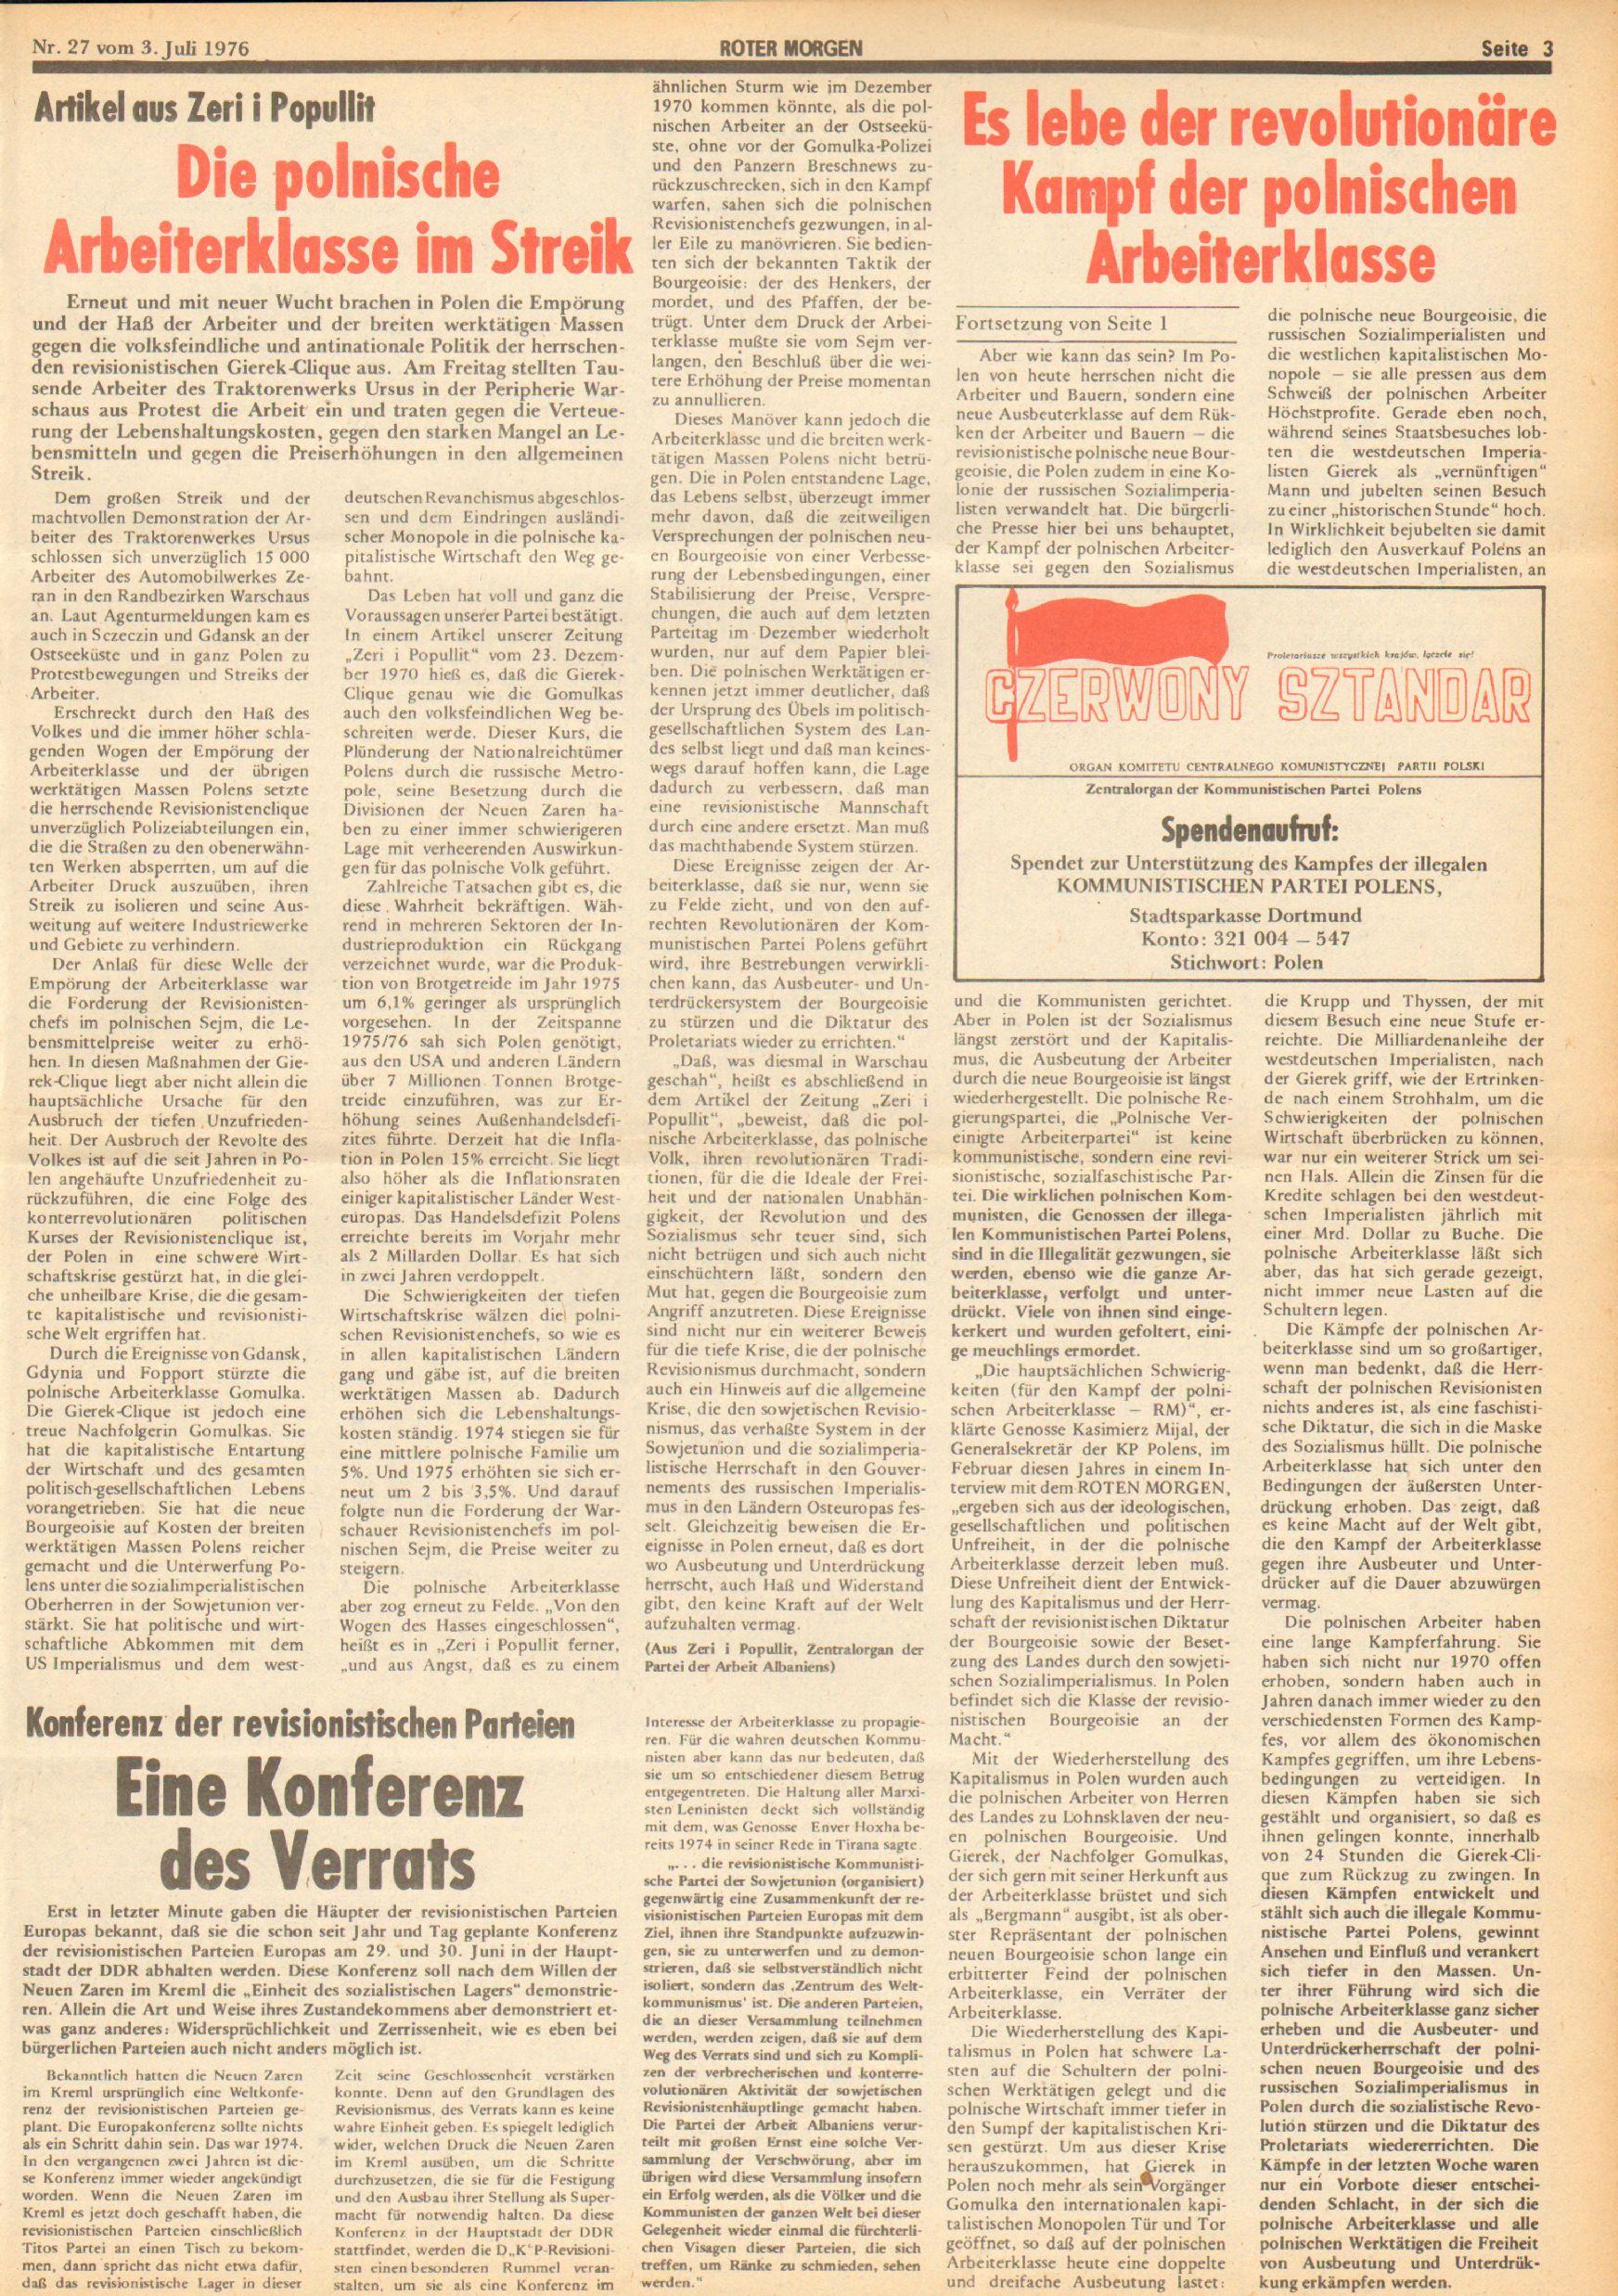 Roter Morgen, 10. Jg., 3. Juli 1976, Nr. 27, Seite 3